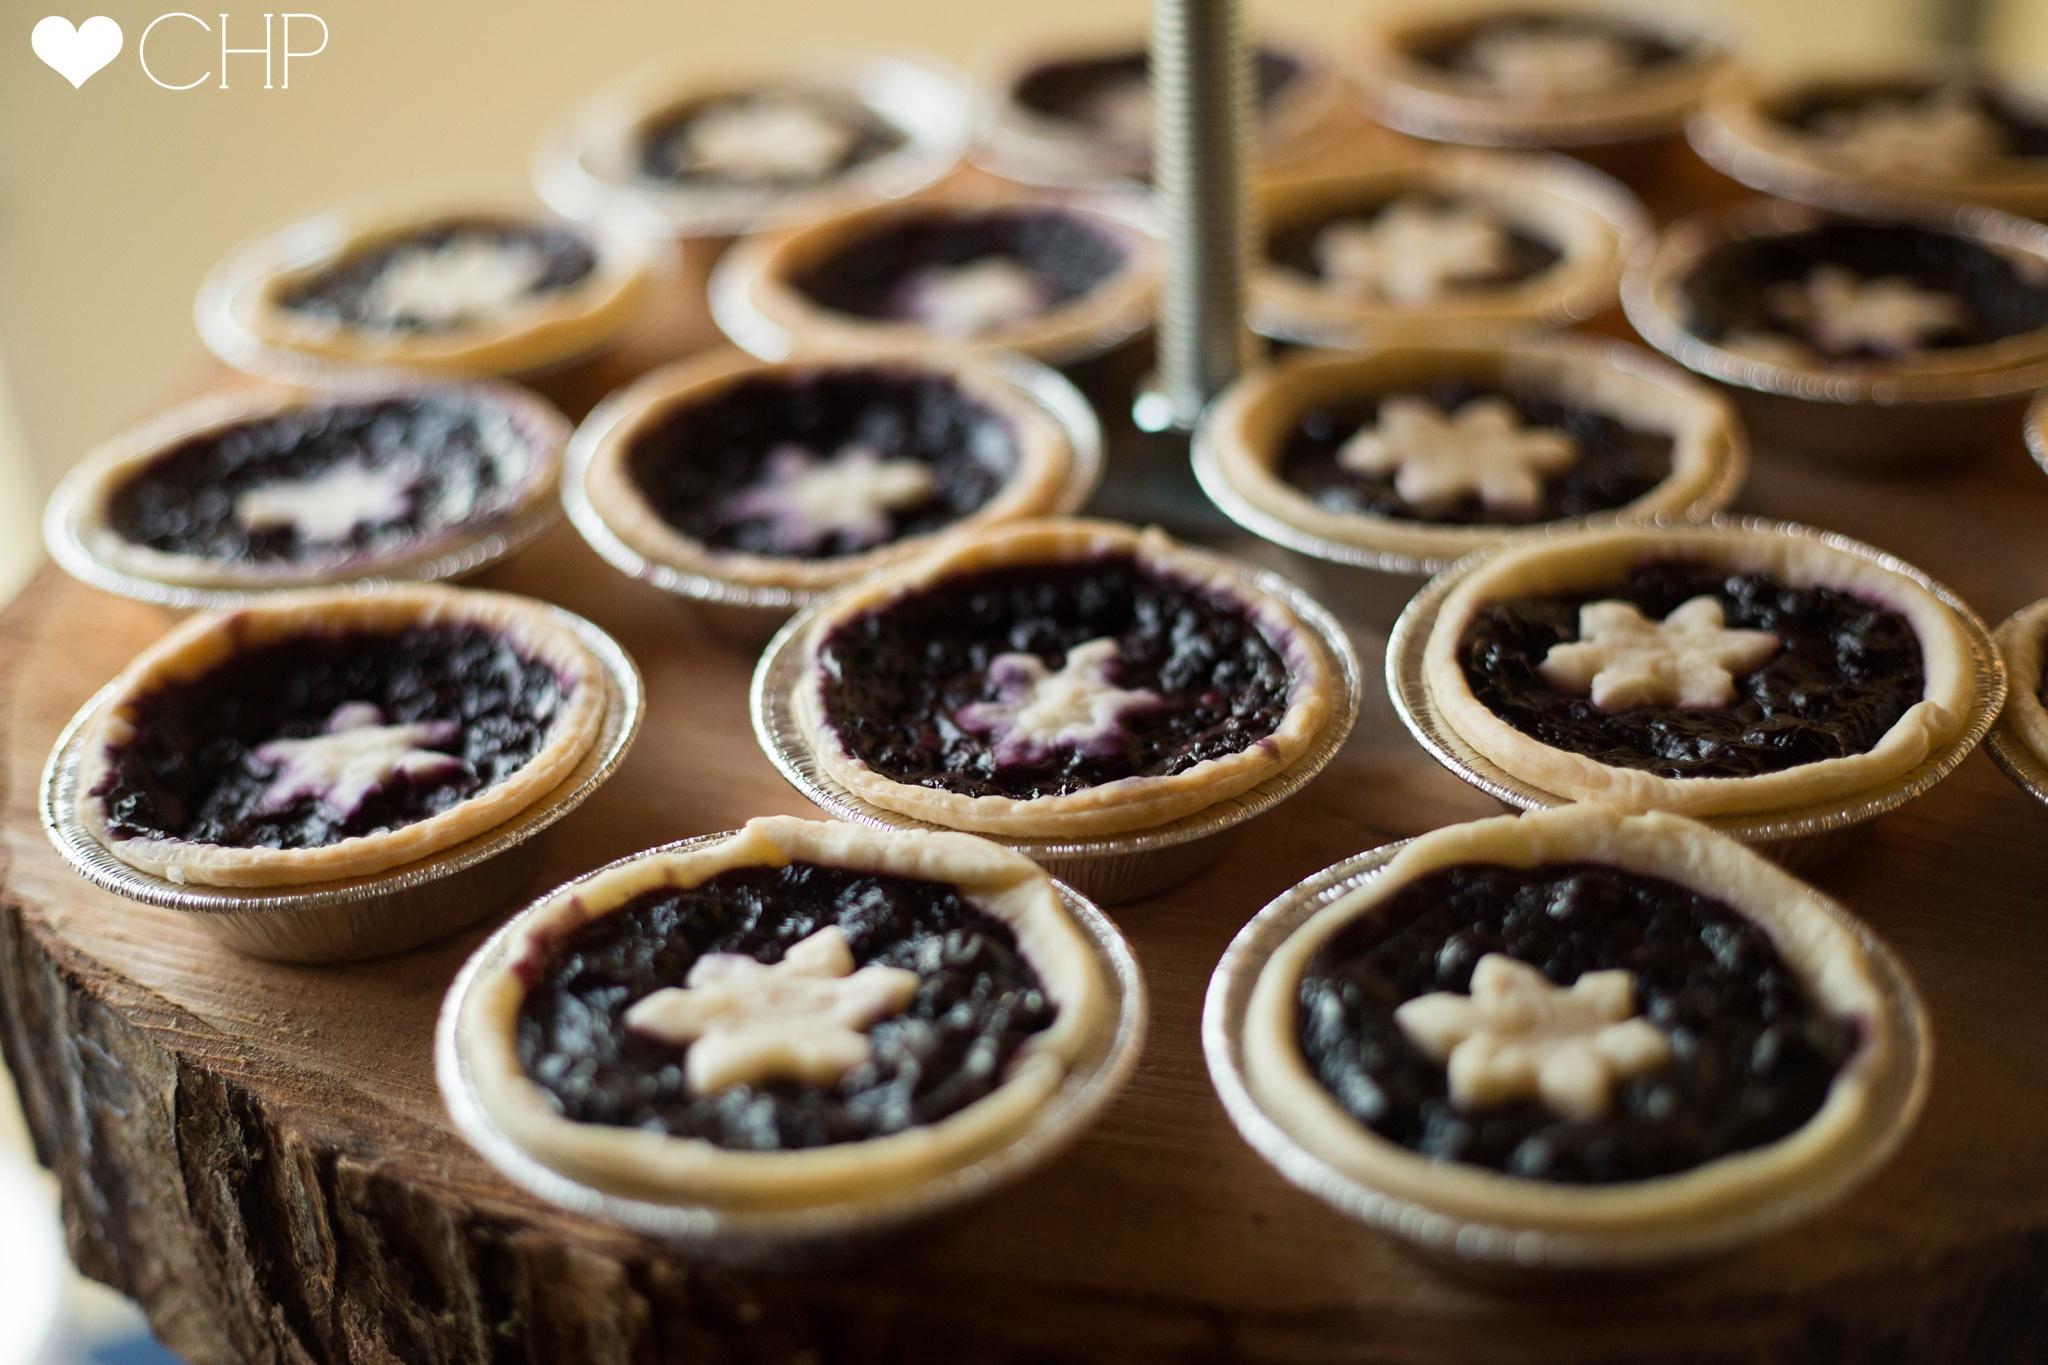 Pies as Wedding Desserts